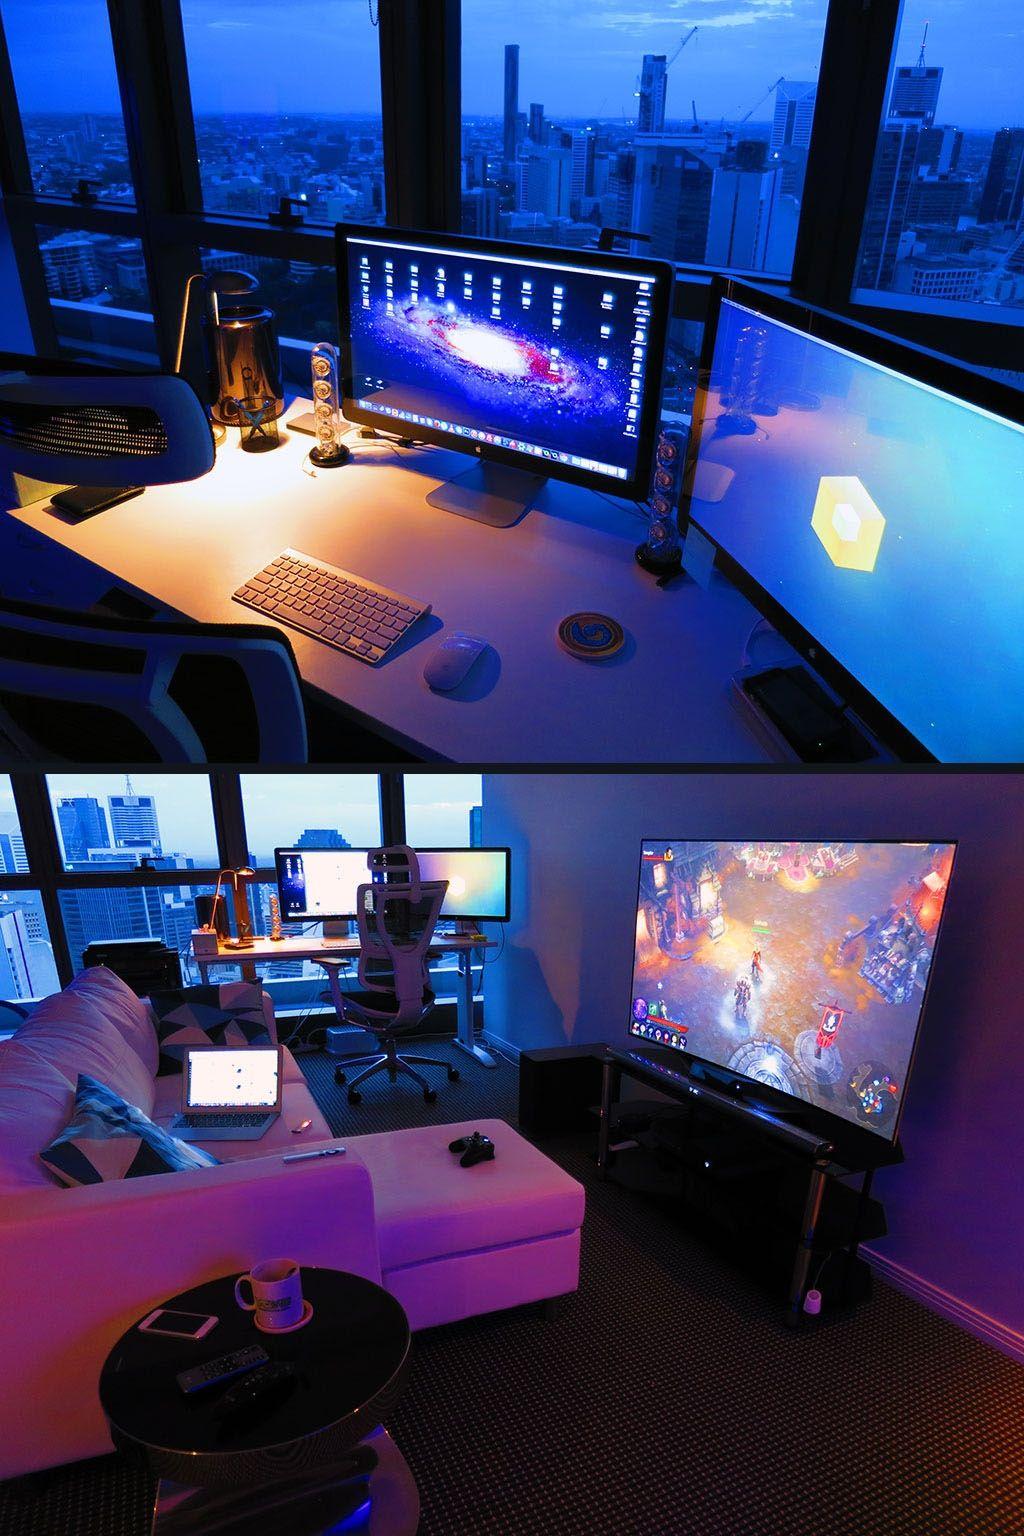 Best Smart Light Bulbs Reddit Video Game Rooms Game Room Design Computer Room